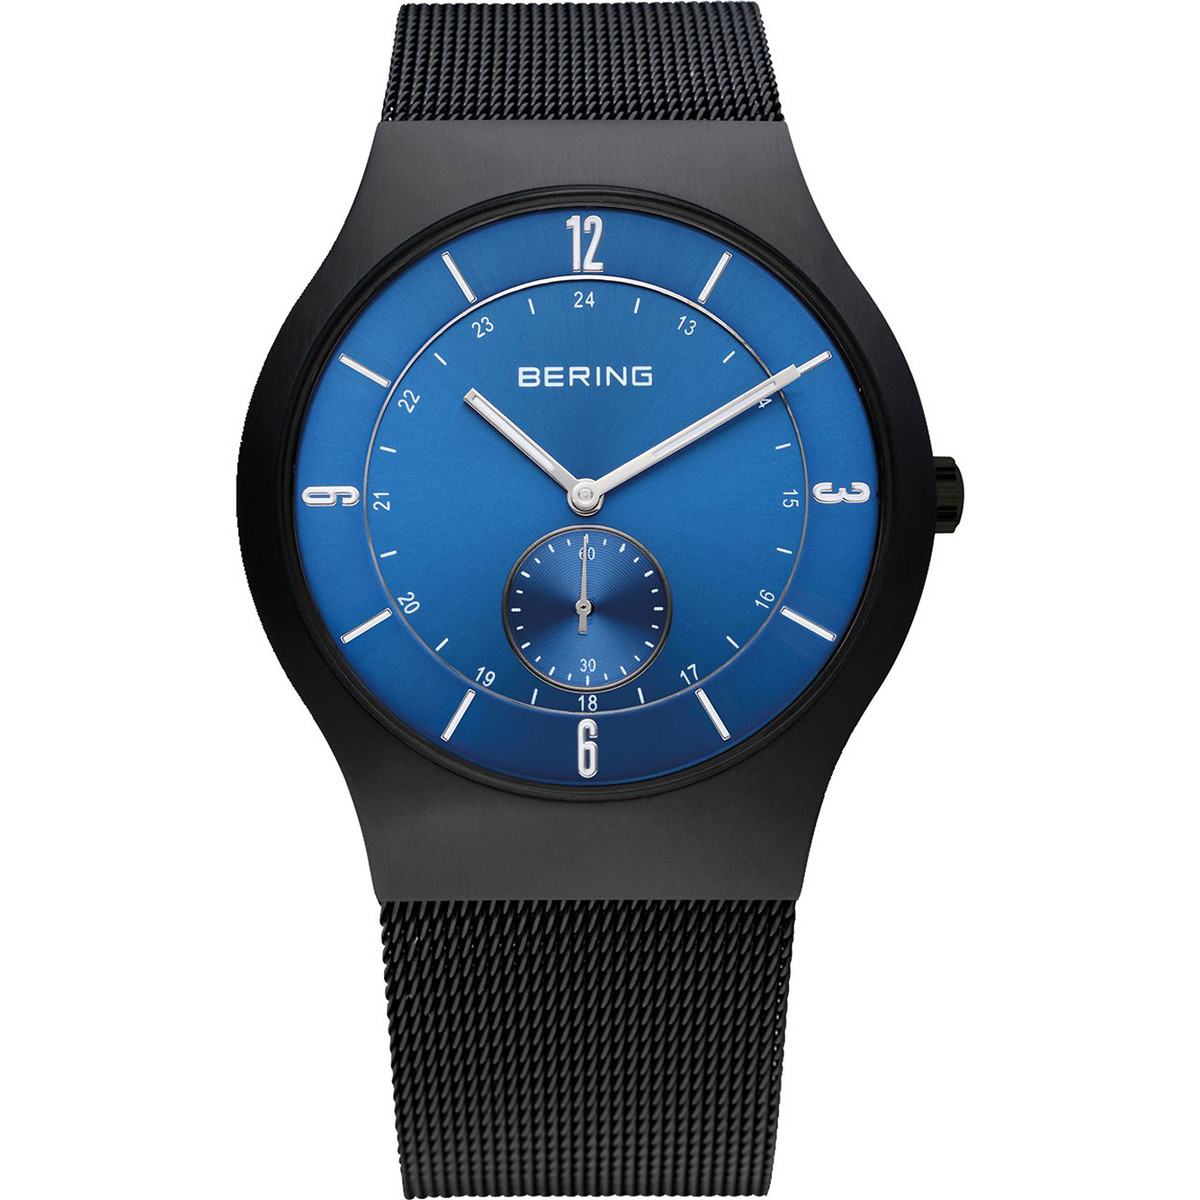 Ceas barbatesc Bering 11940-227 Automatic de mana original